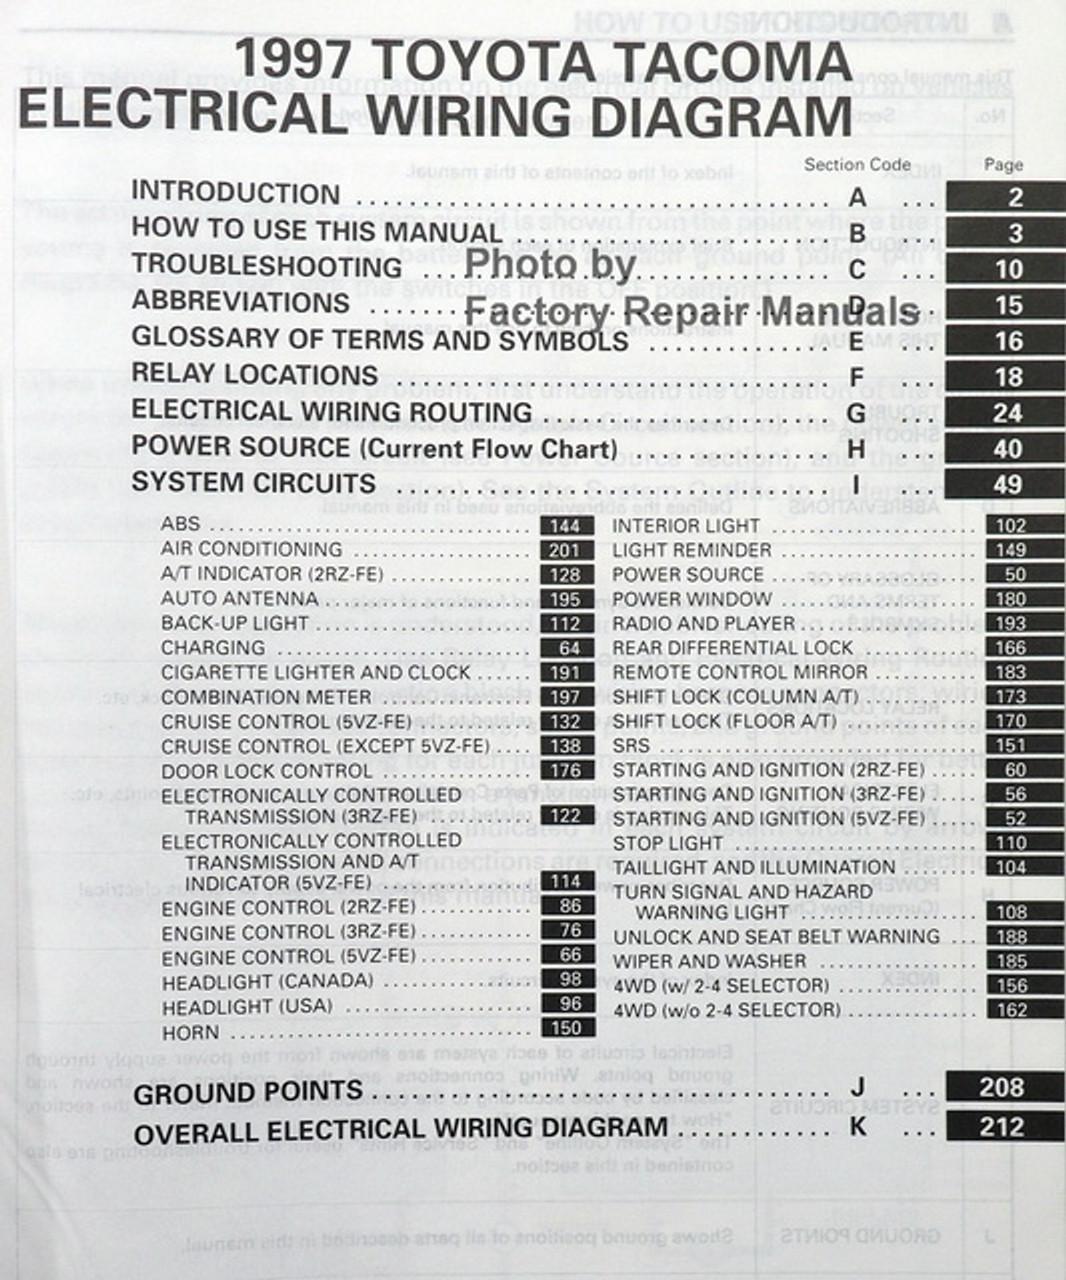 Wiring Diagram Toyota Tacoma